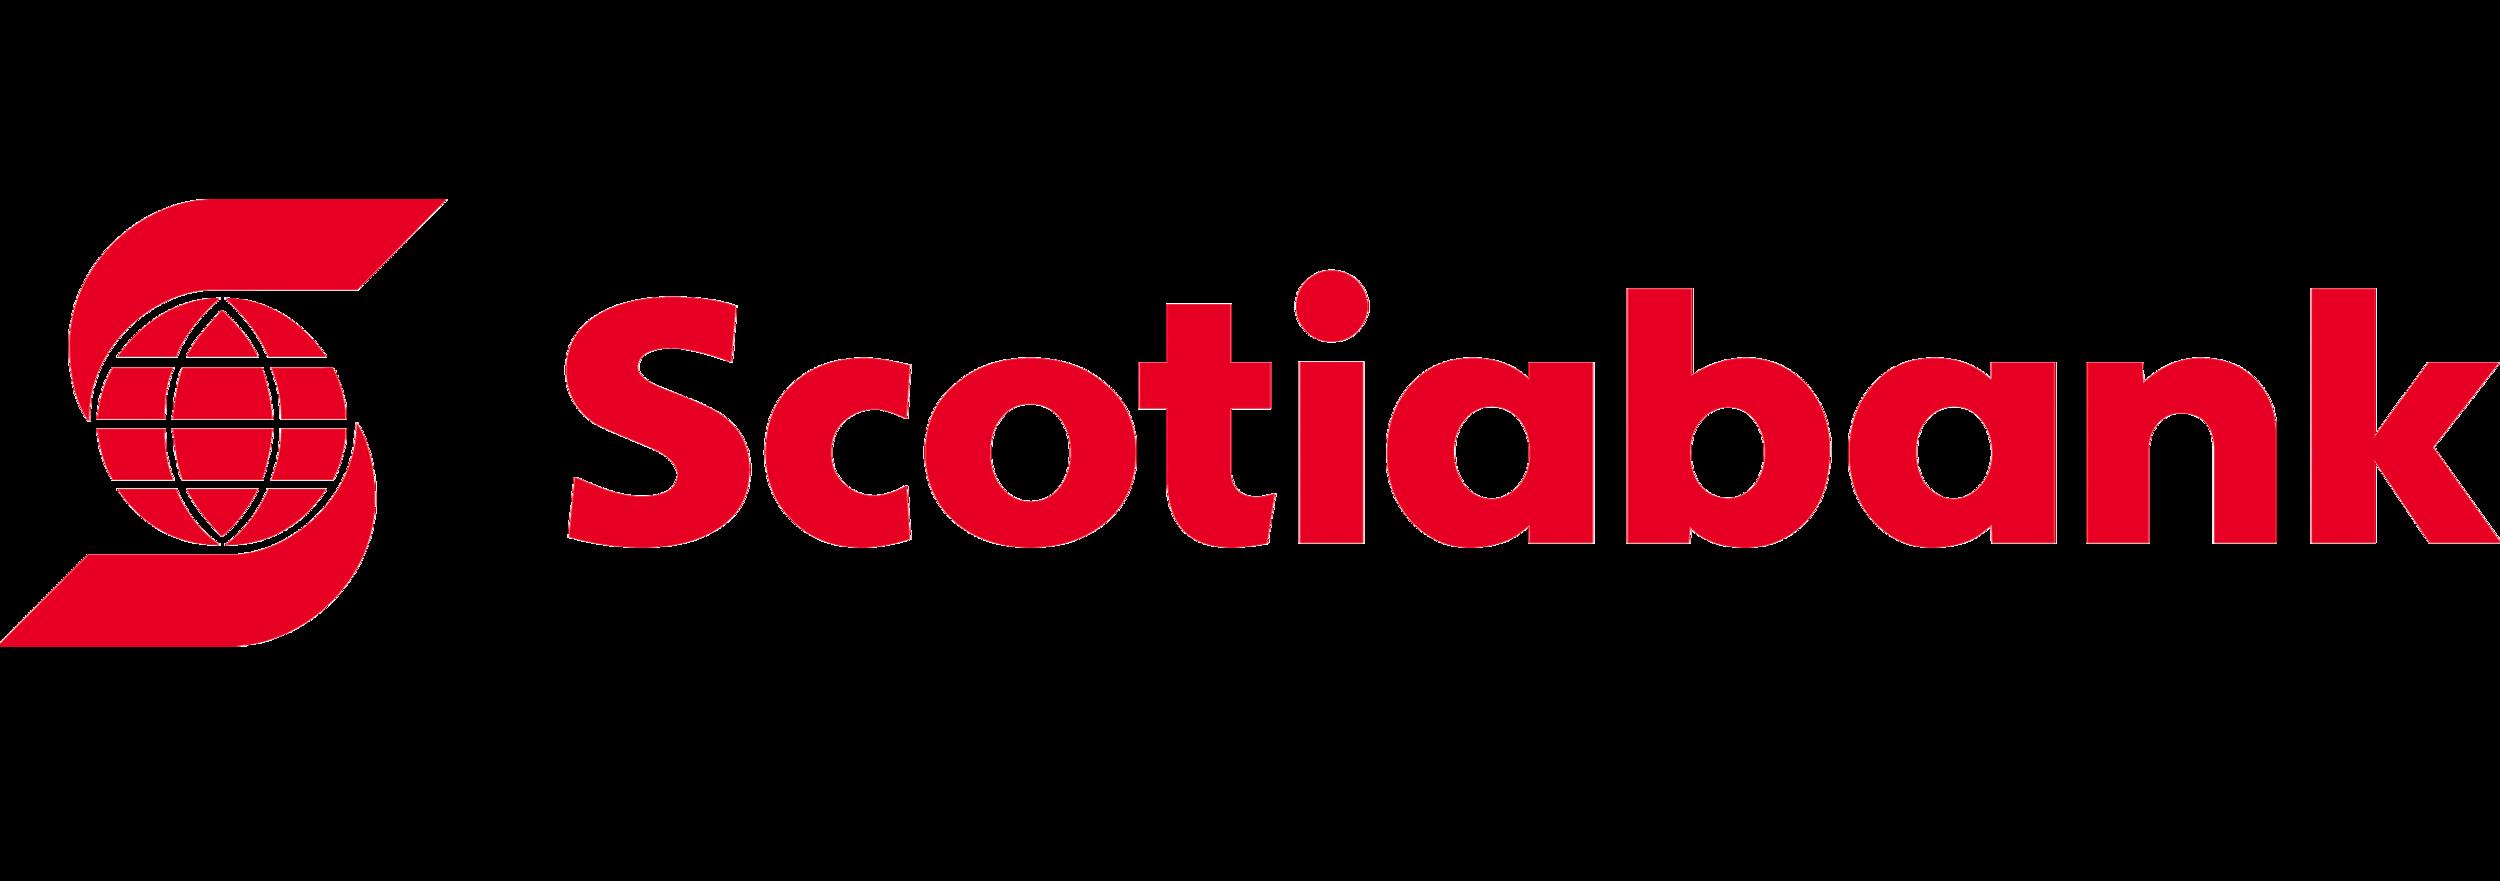 Scotiabank 3.png